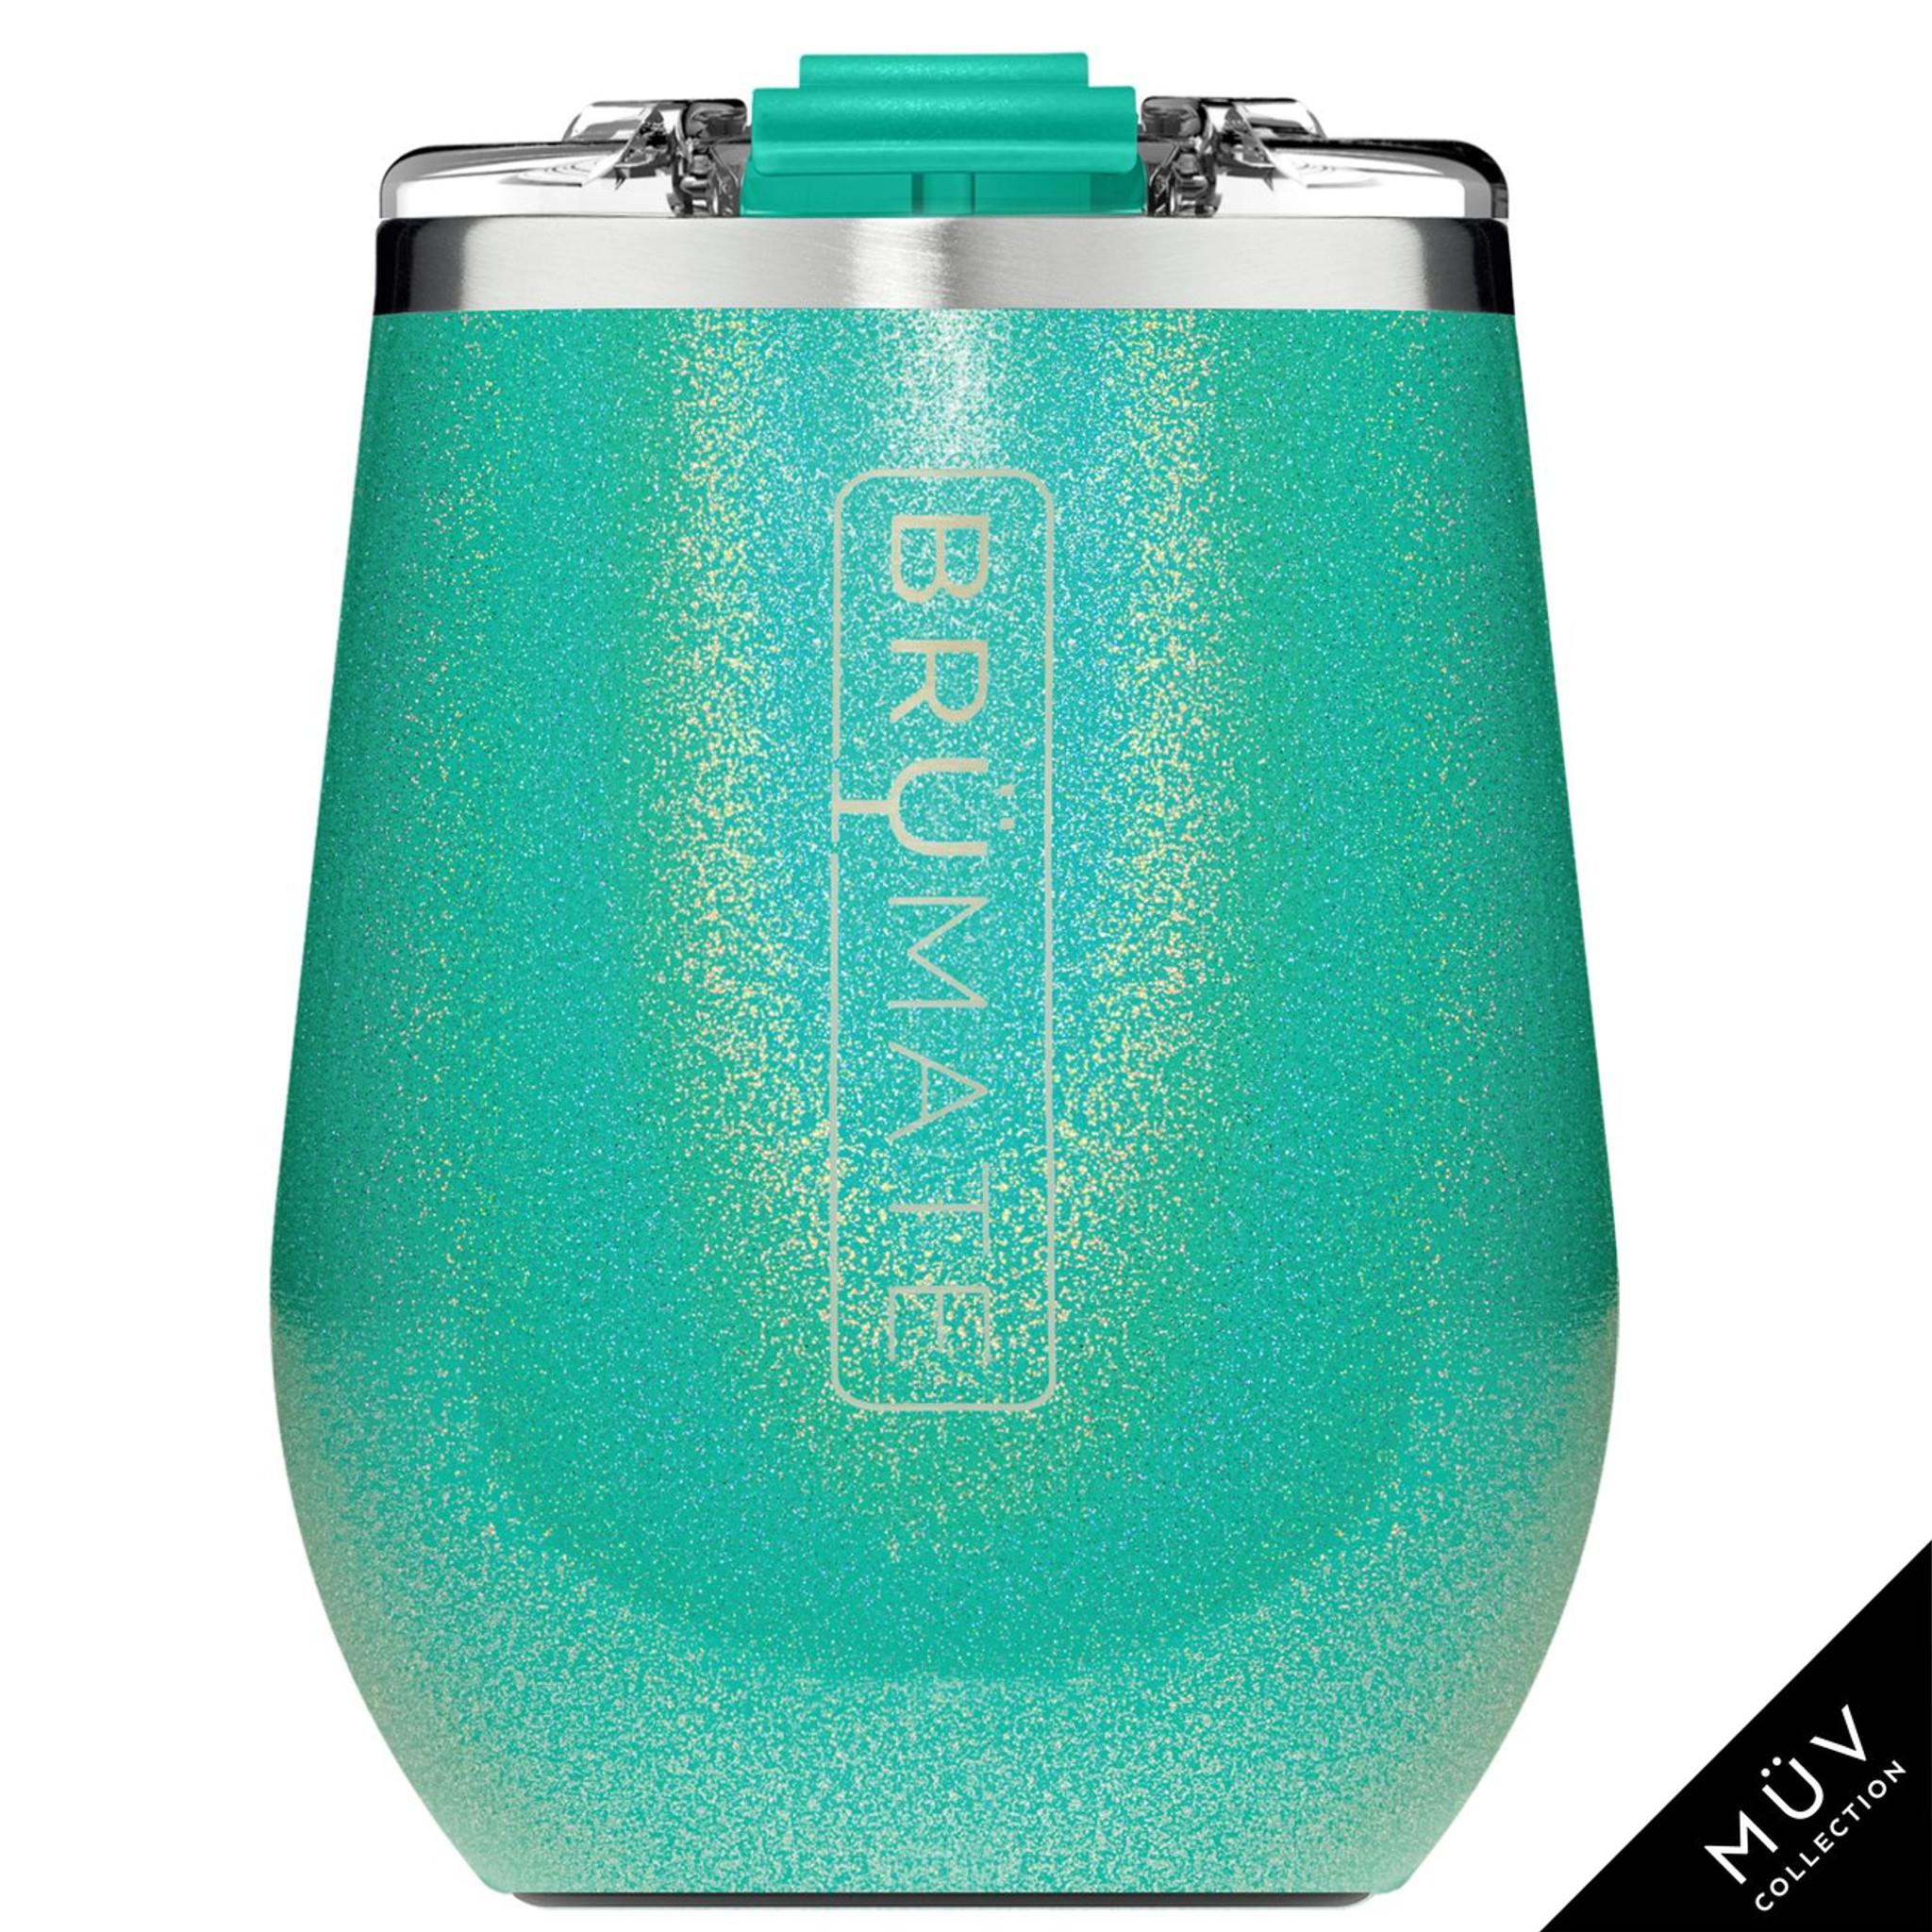 Brumate MuV Wine Tumbler - Glitter Peacock